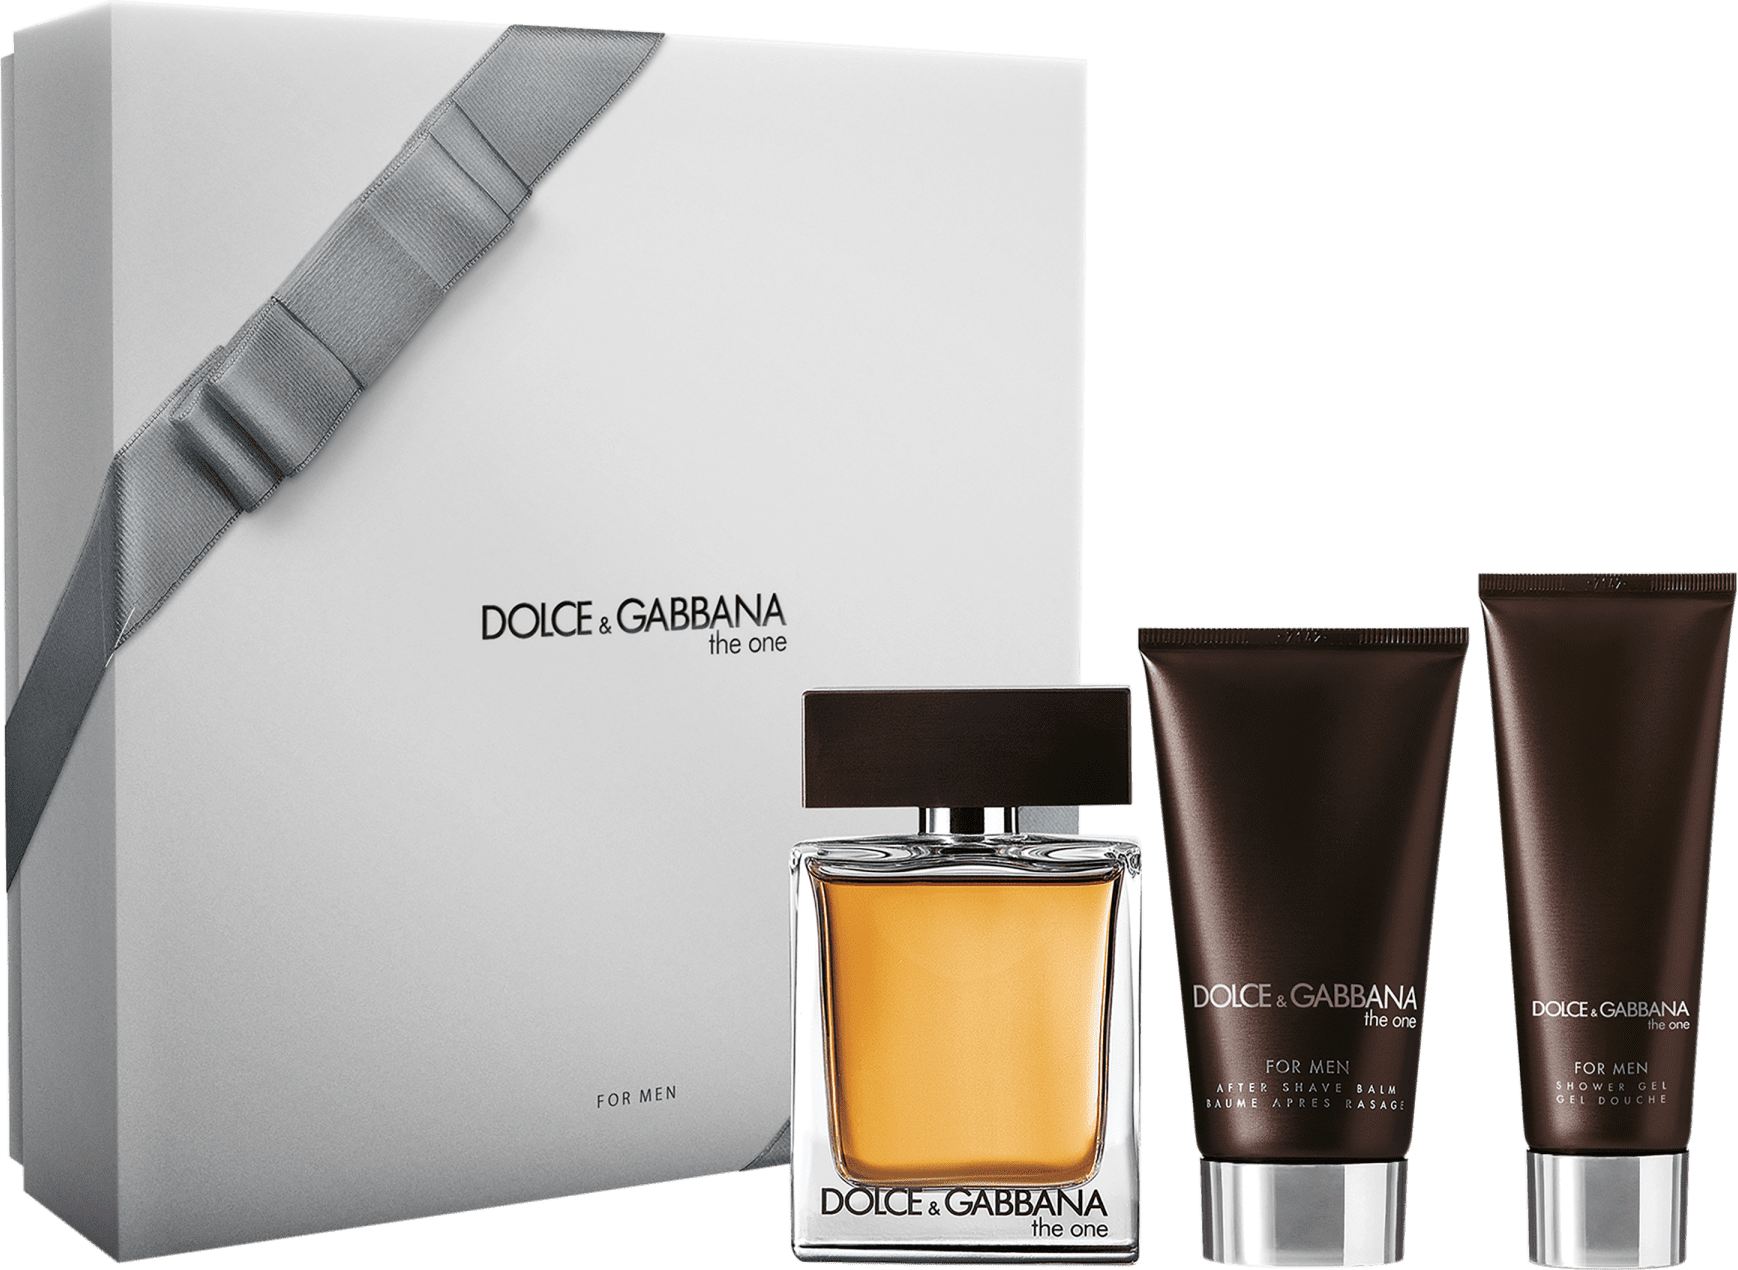 28cff7f242 Conjunto Dolce & Gabbana The One Men Masculino - Eau de Toilette 100ml +  Pós-